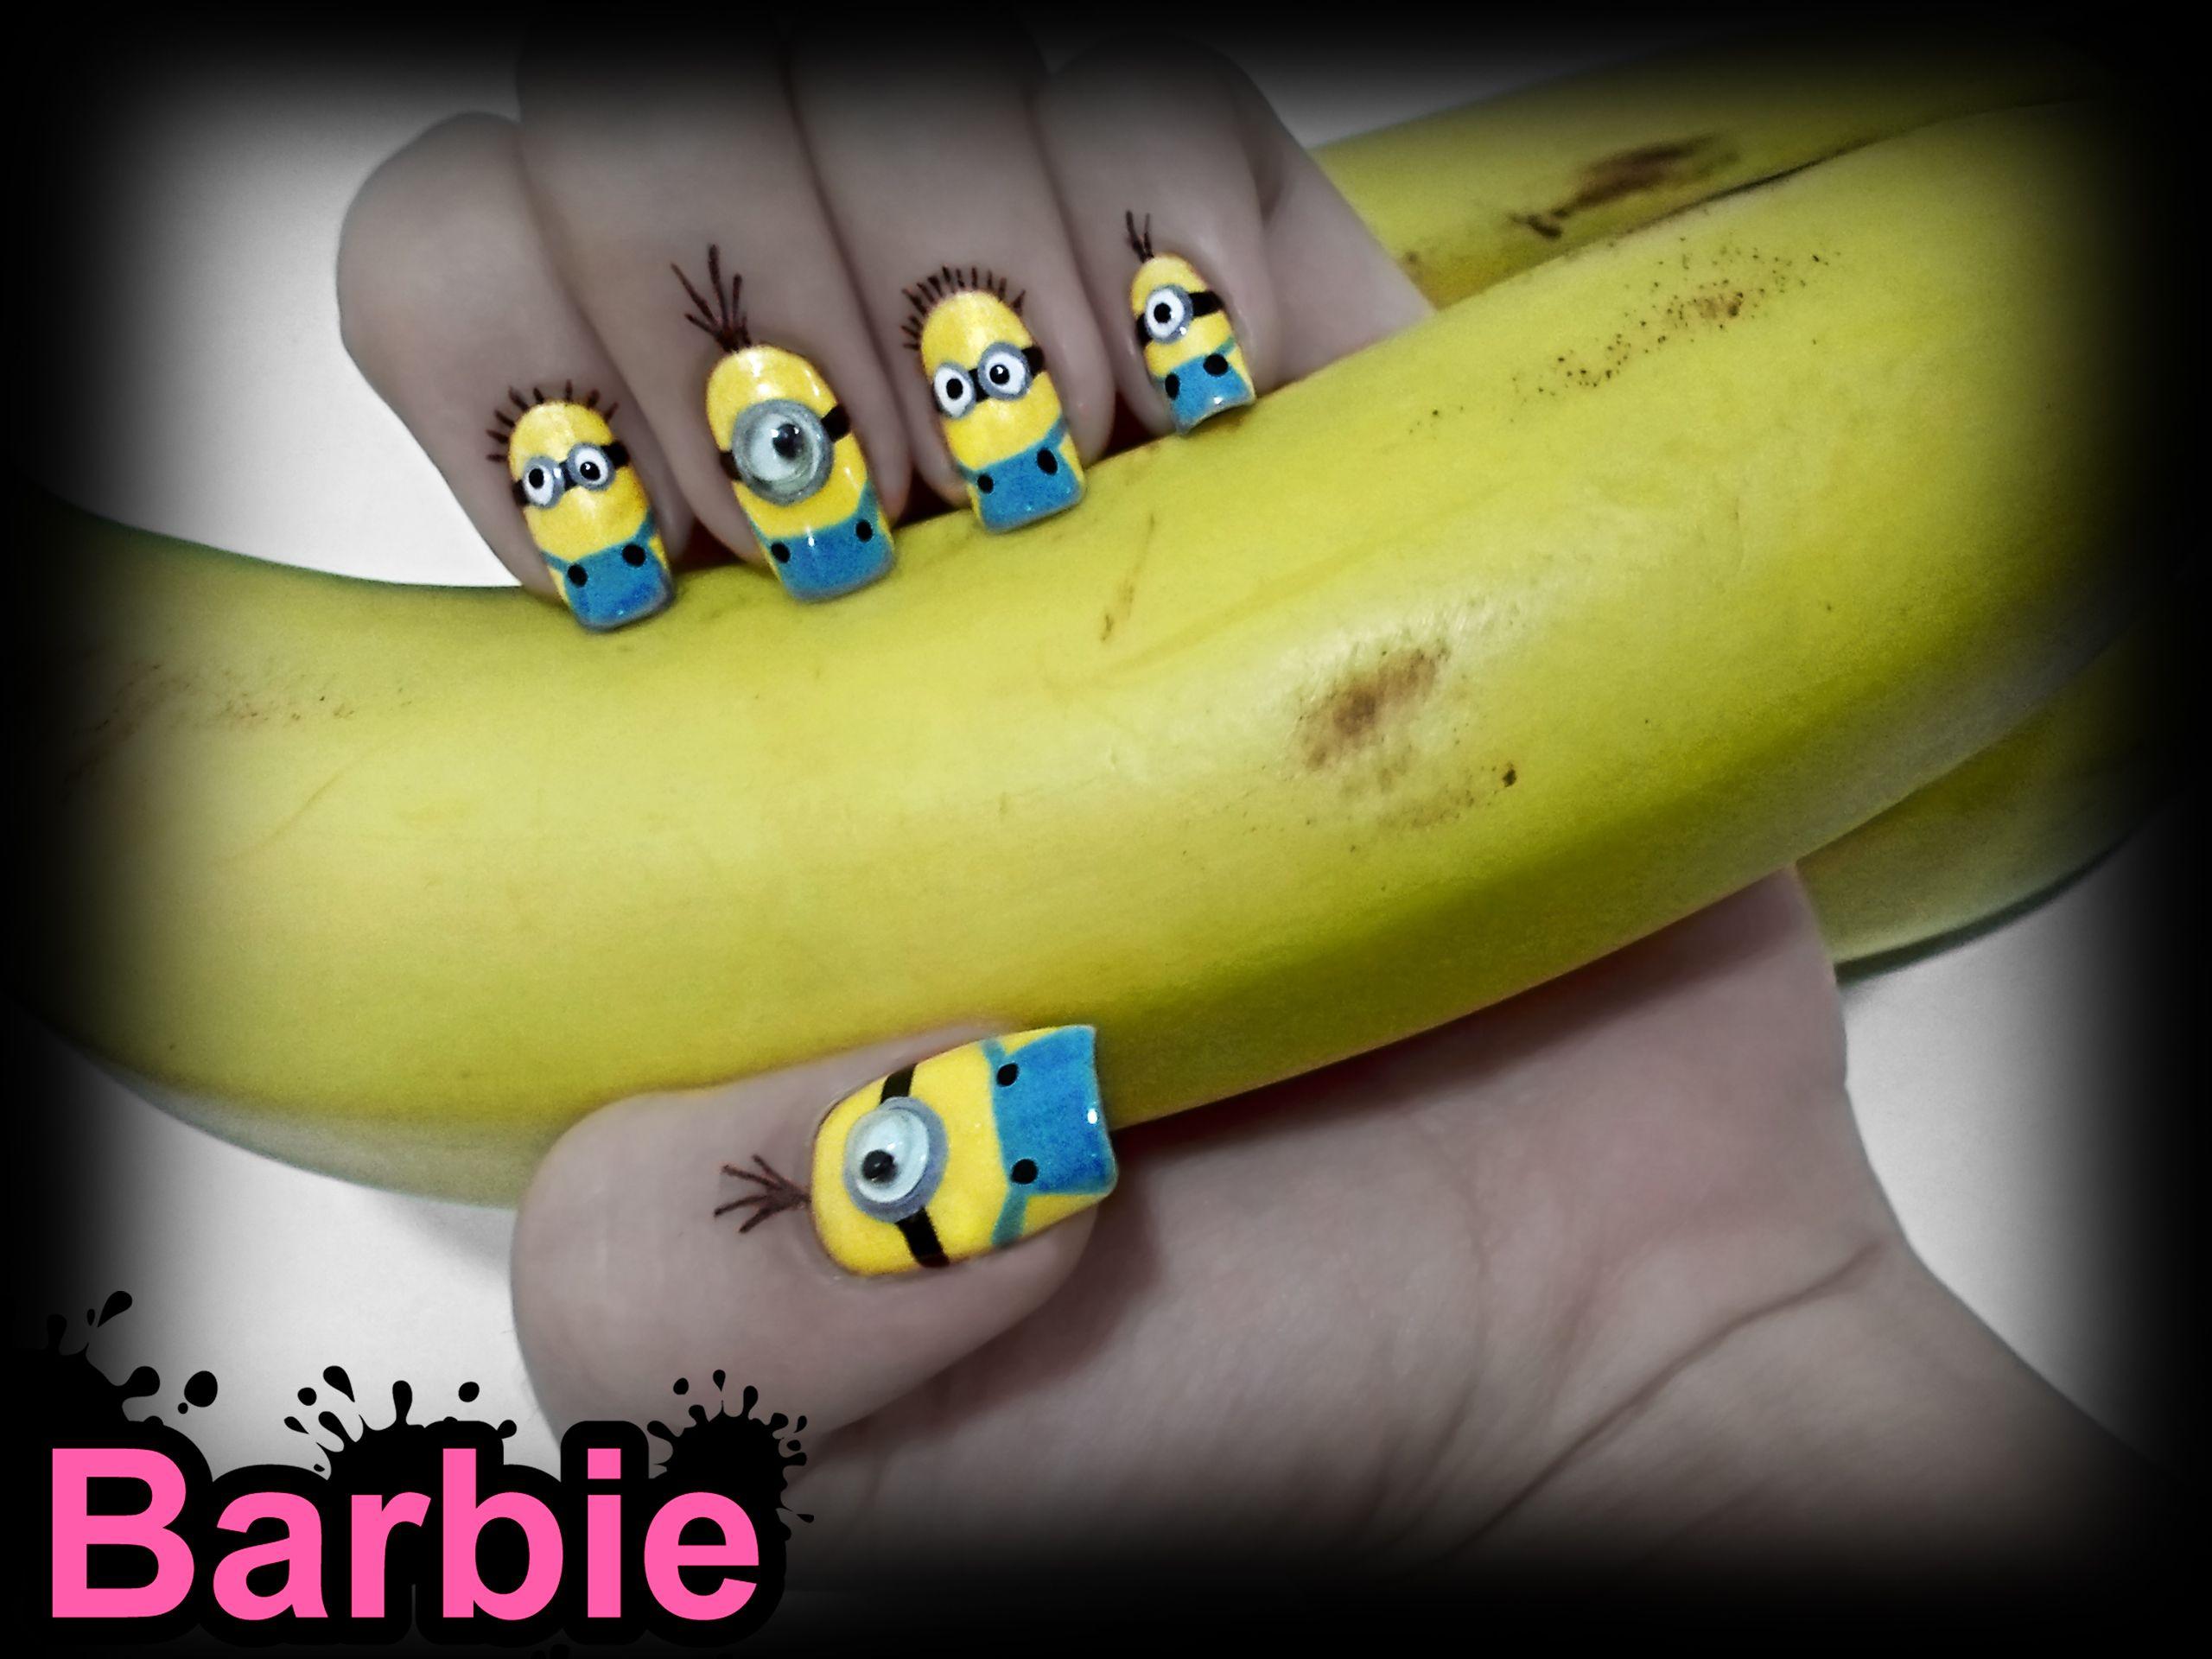 Minion Nails - Minion shaped nail design, Cute yellow characters ...